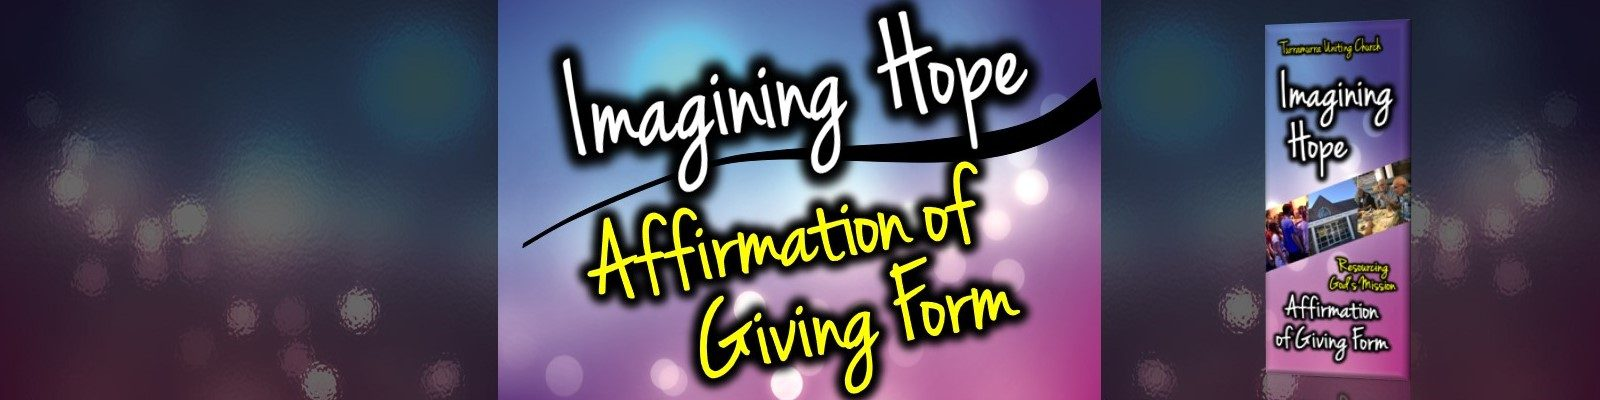 Imagining Hope Affirmation of Giving Form